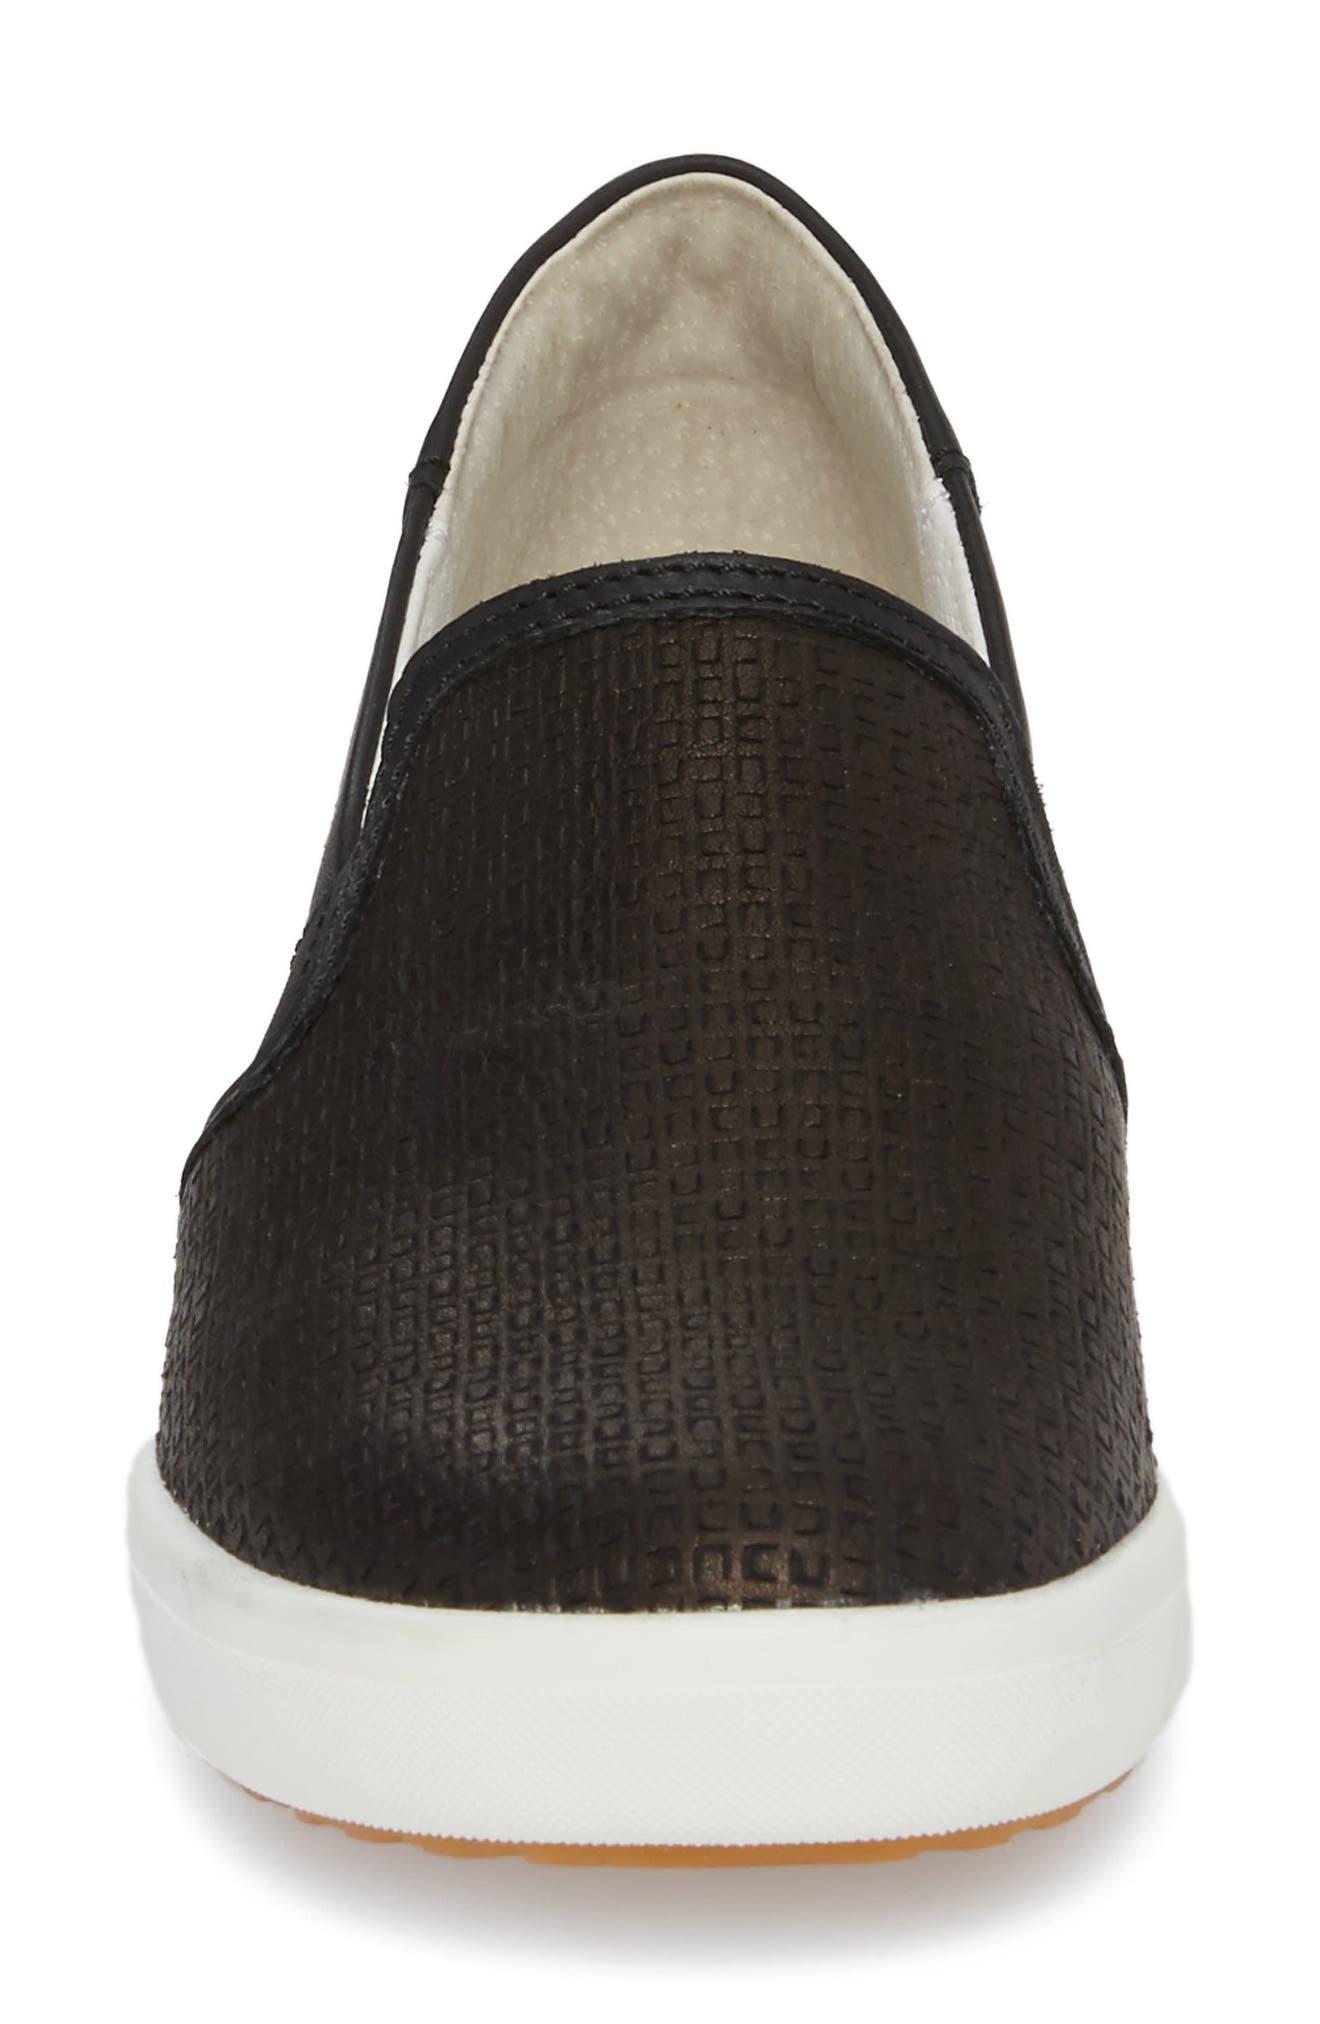 Sina 39 Sneaker,                             Alternate thumbnail 4, color,                             BLACK LEATHER